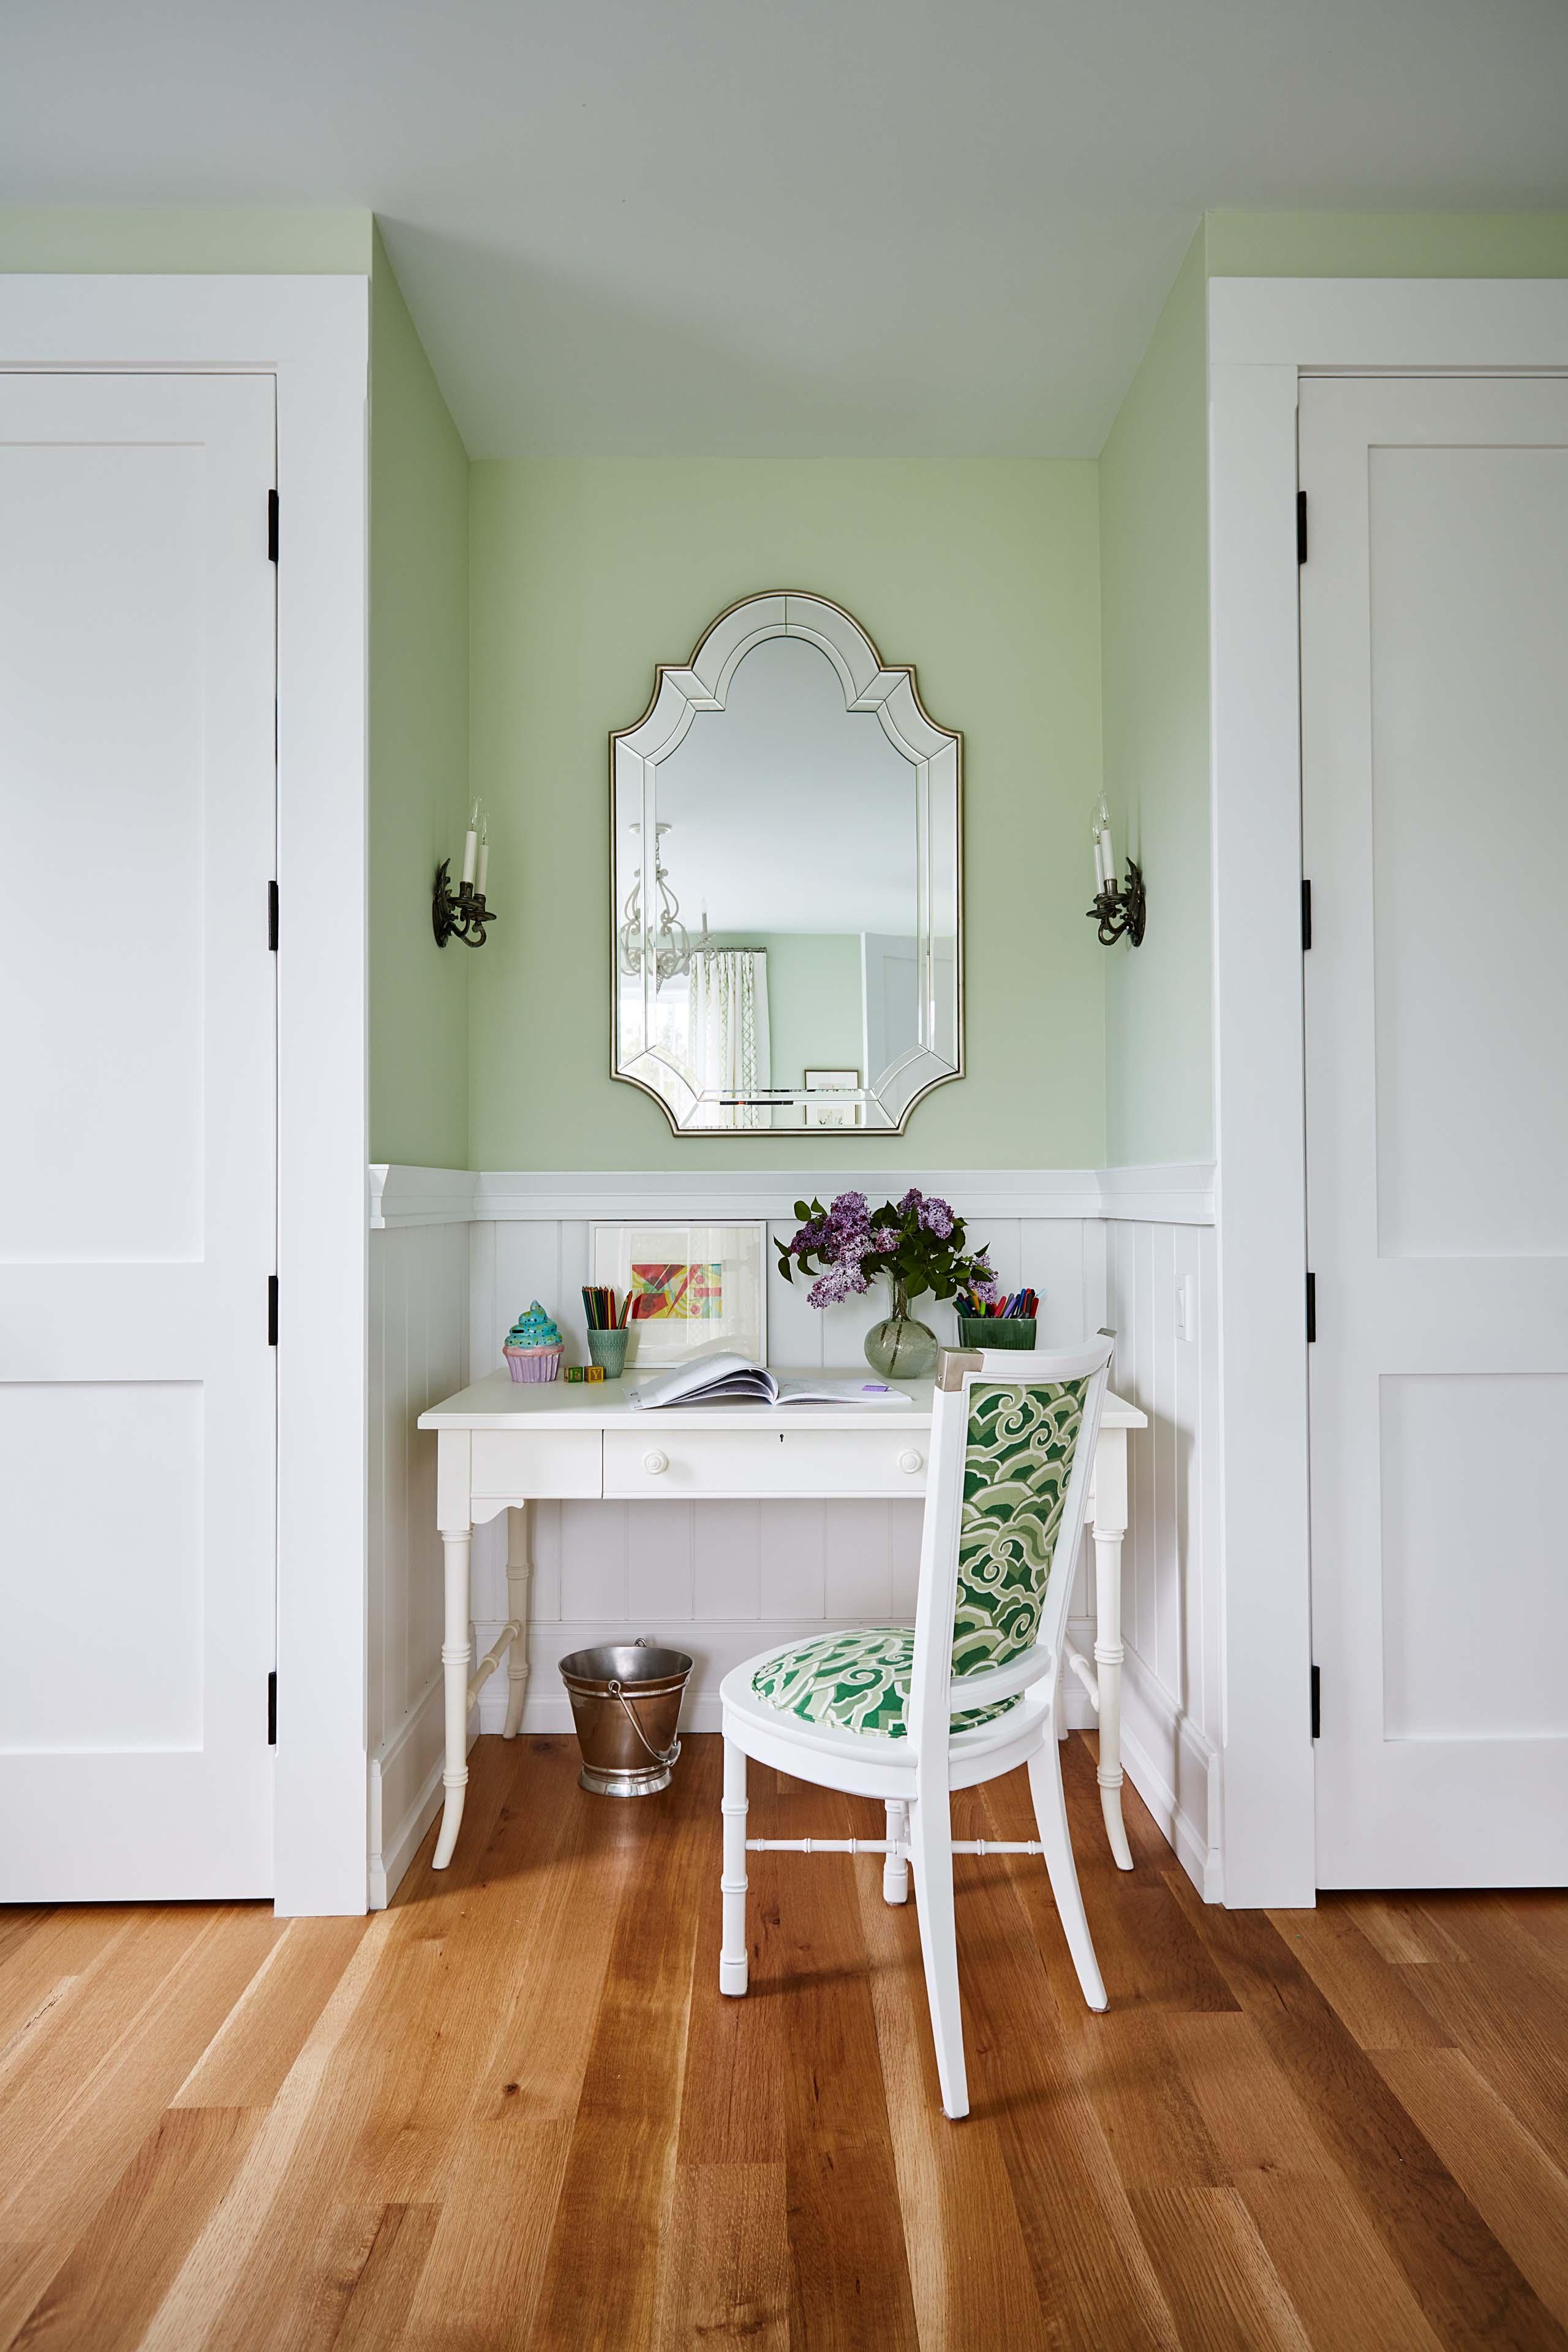 Cottage green walls in bedroom with white woodwork. #SarahRIchardson #cottagebedroom #lightgreenwalls